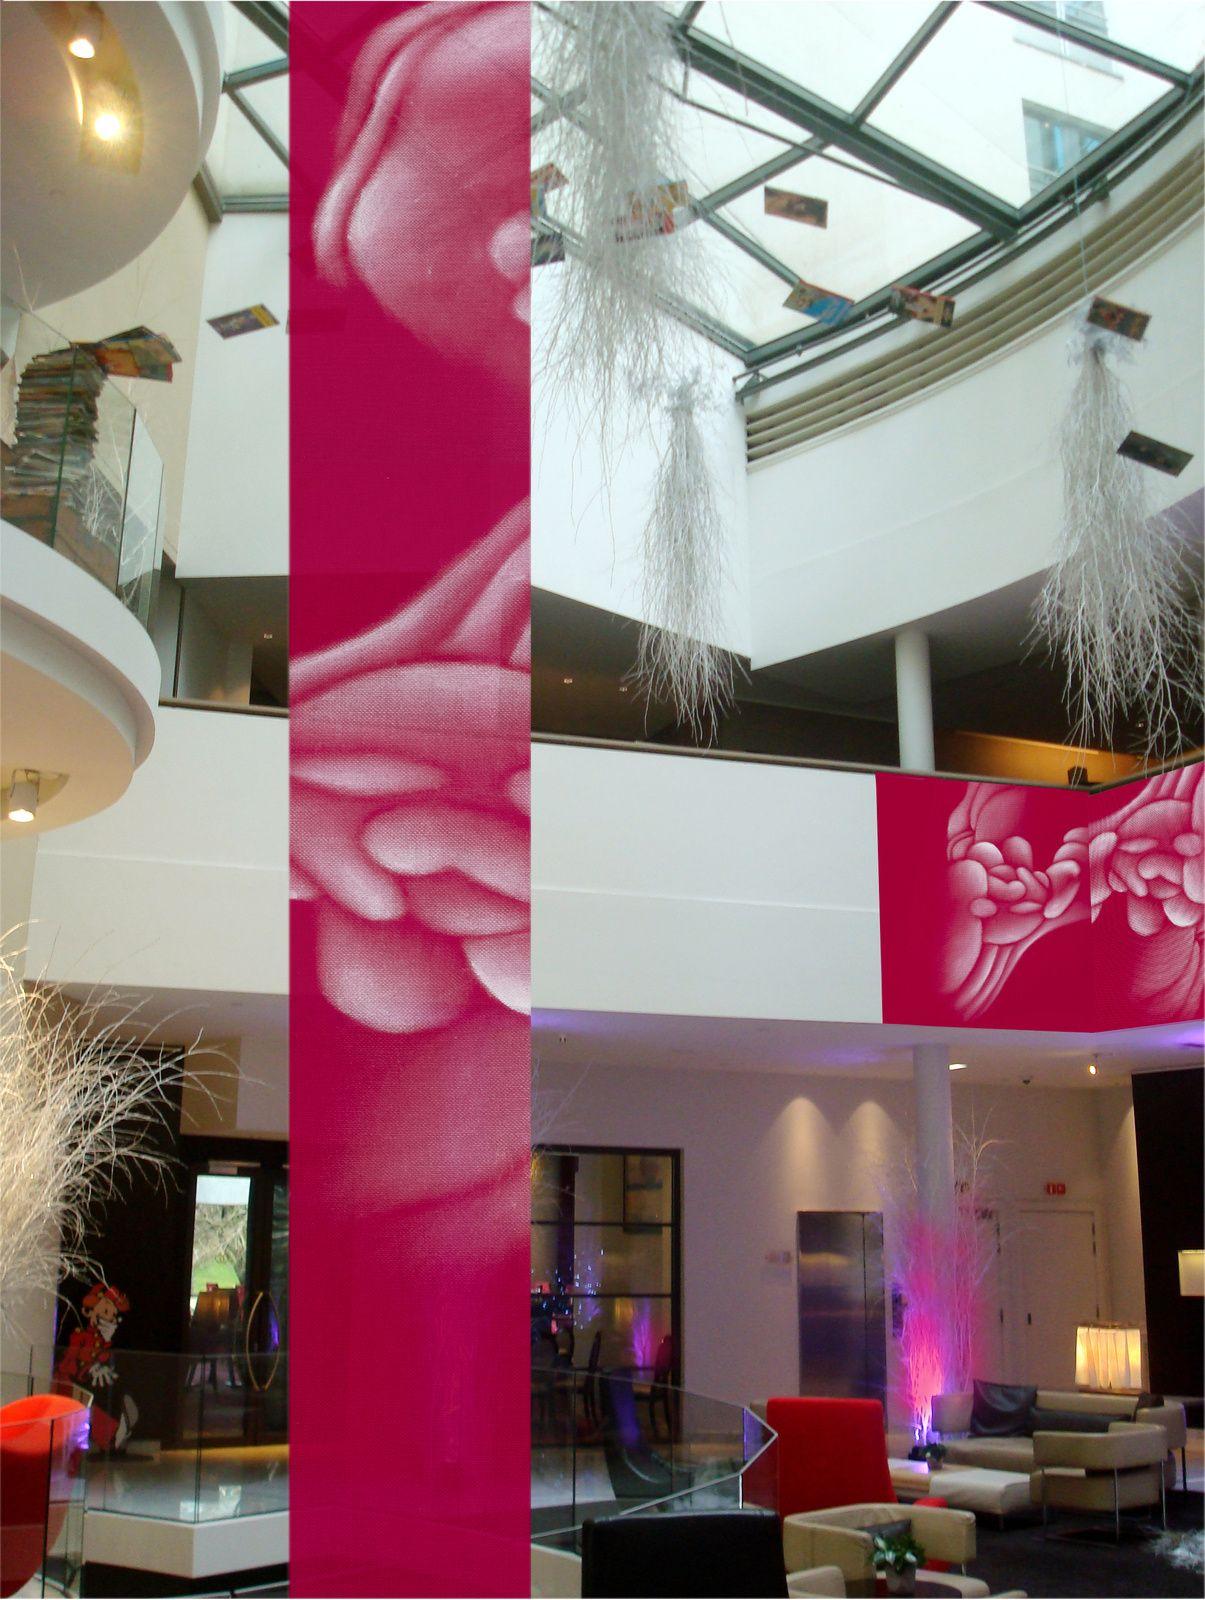 Sofitel Brussels Europe hotel presents aGuillaume Bottazzi's installation